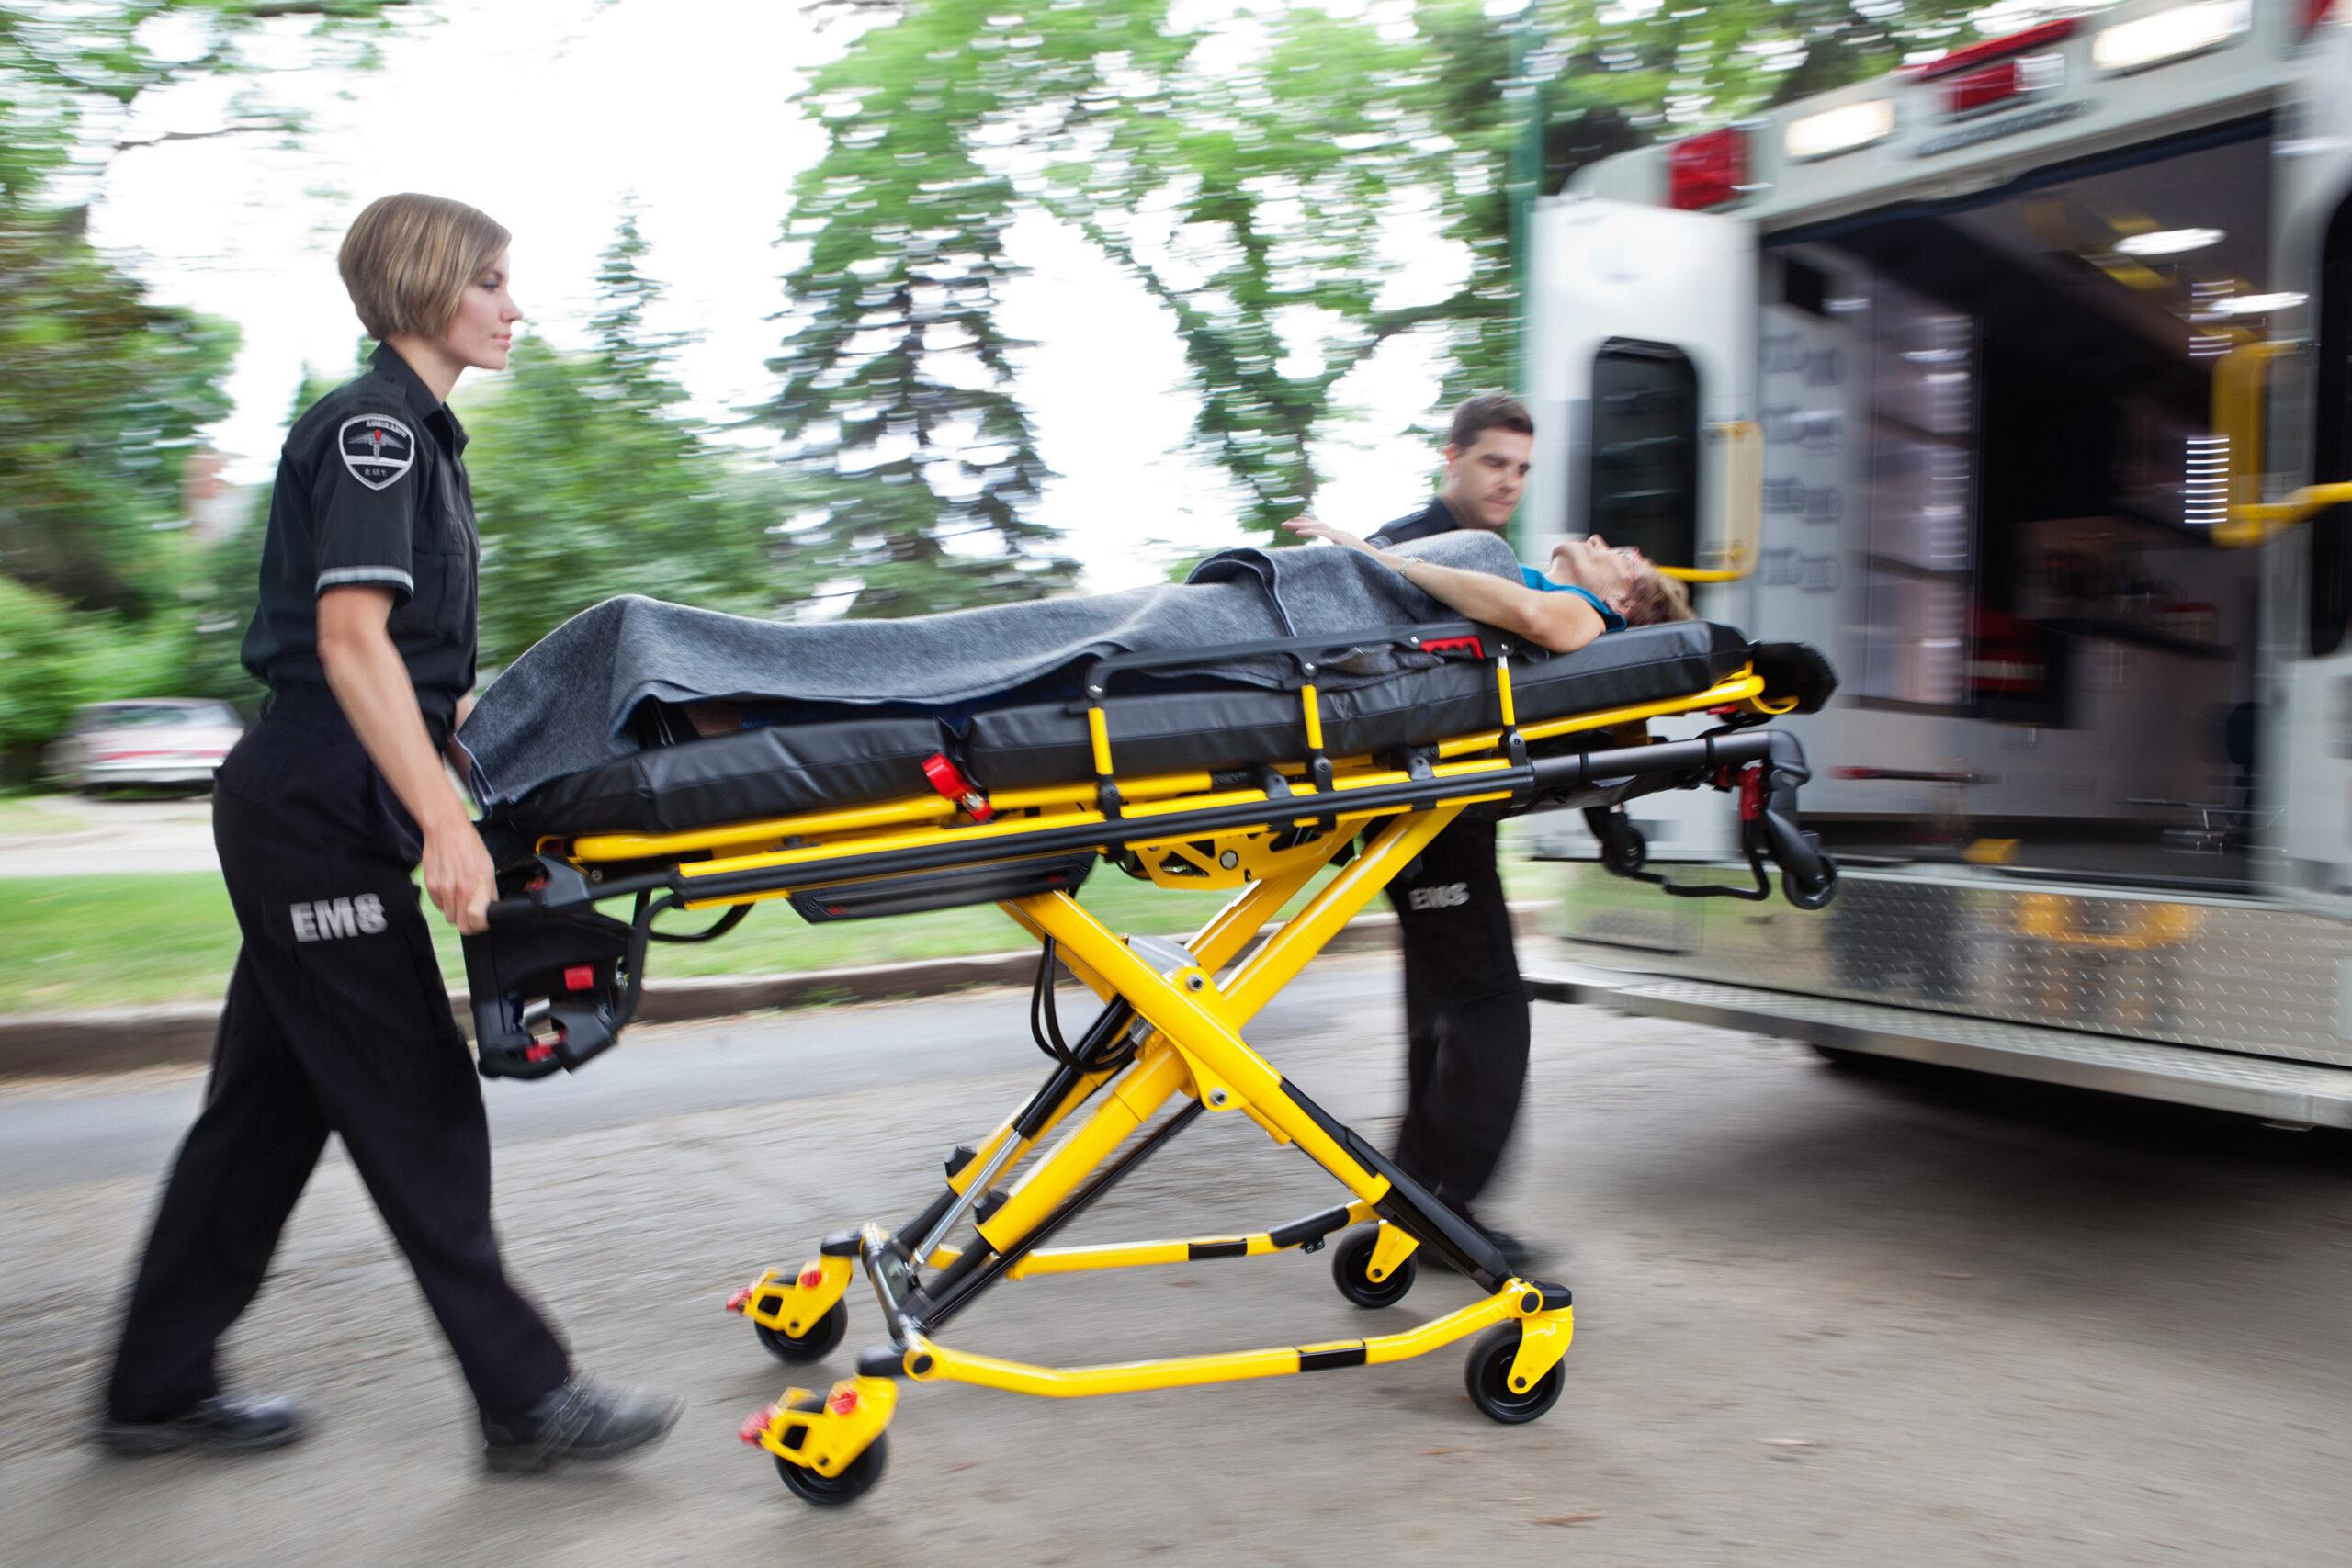 Paramedics taking a patient to an ambulance